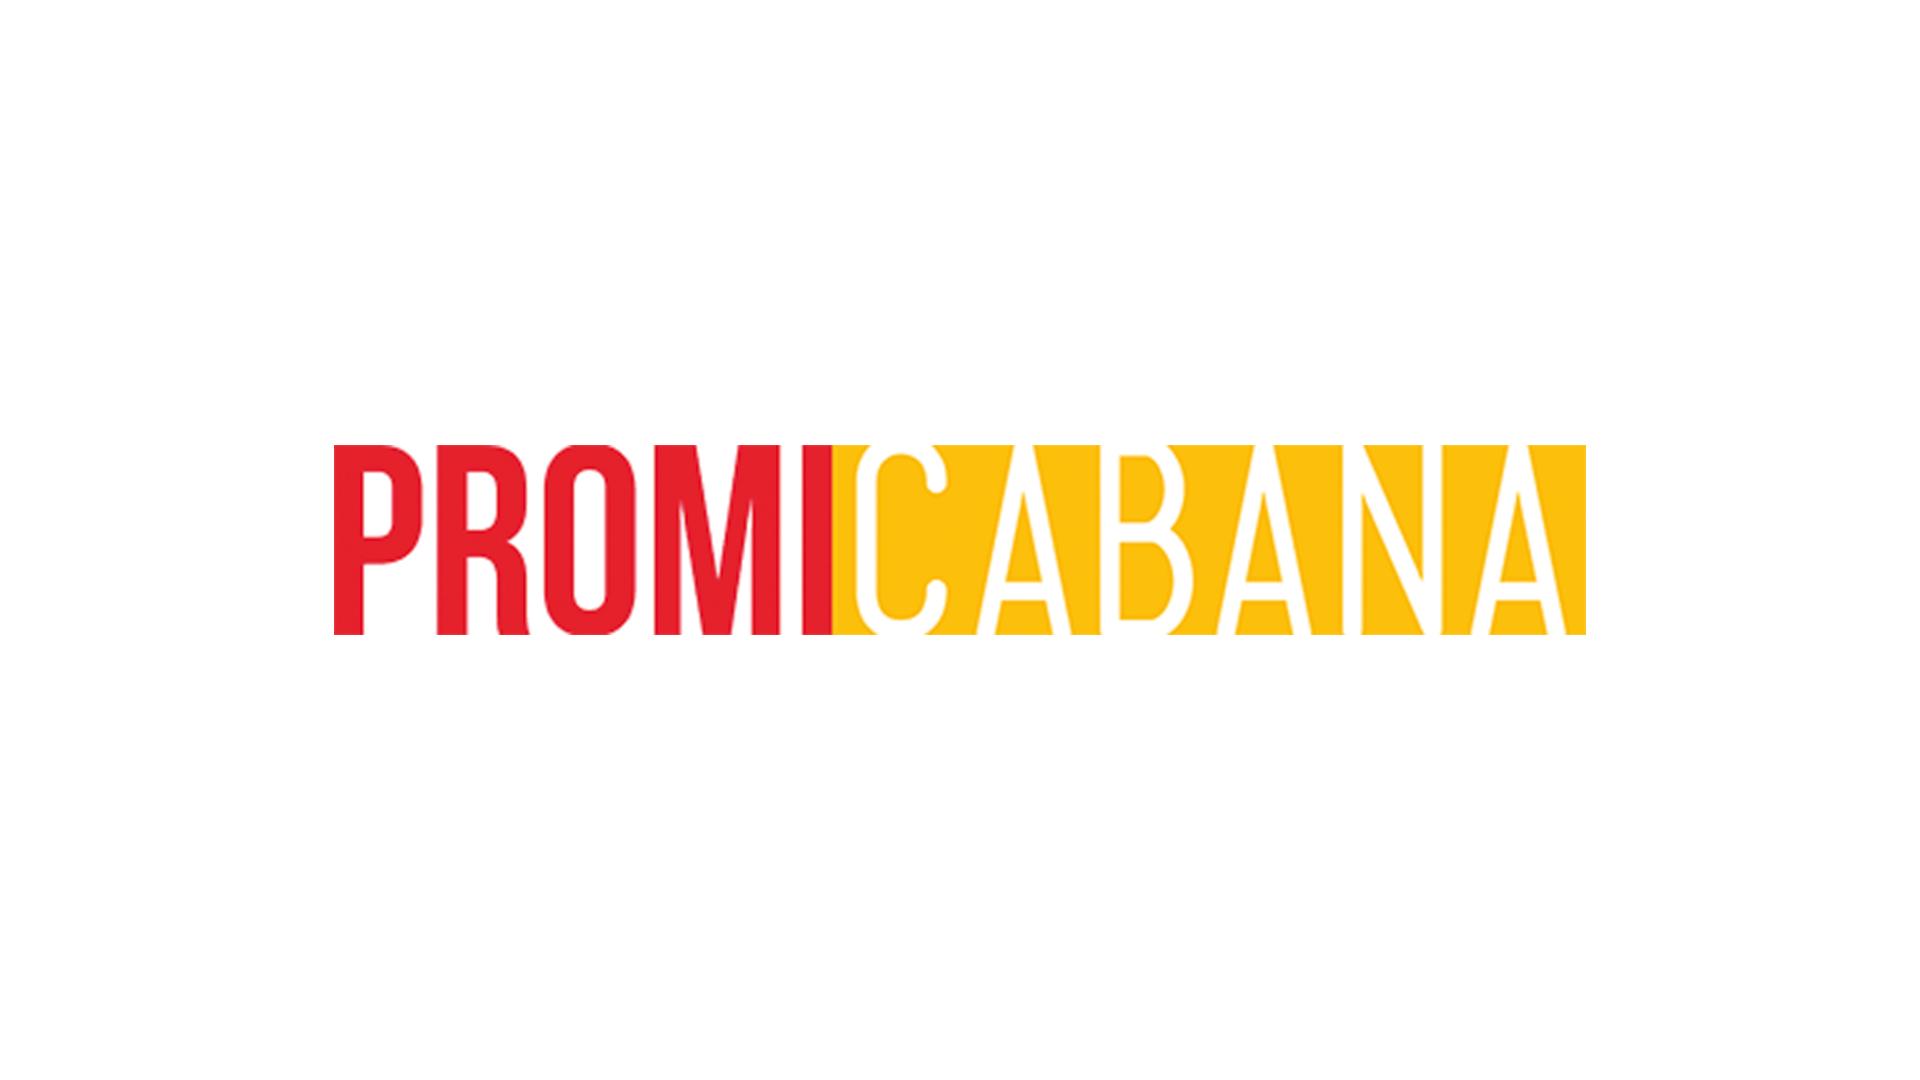 Ariana-Grande-John-Legend-Beauty-and-the-Beast-Musikvideo